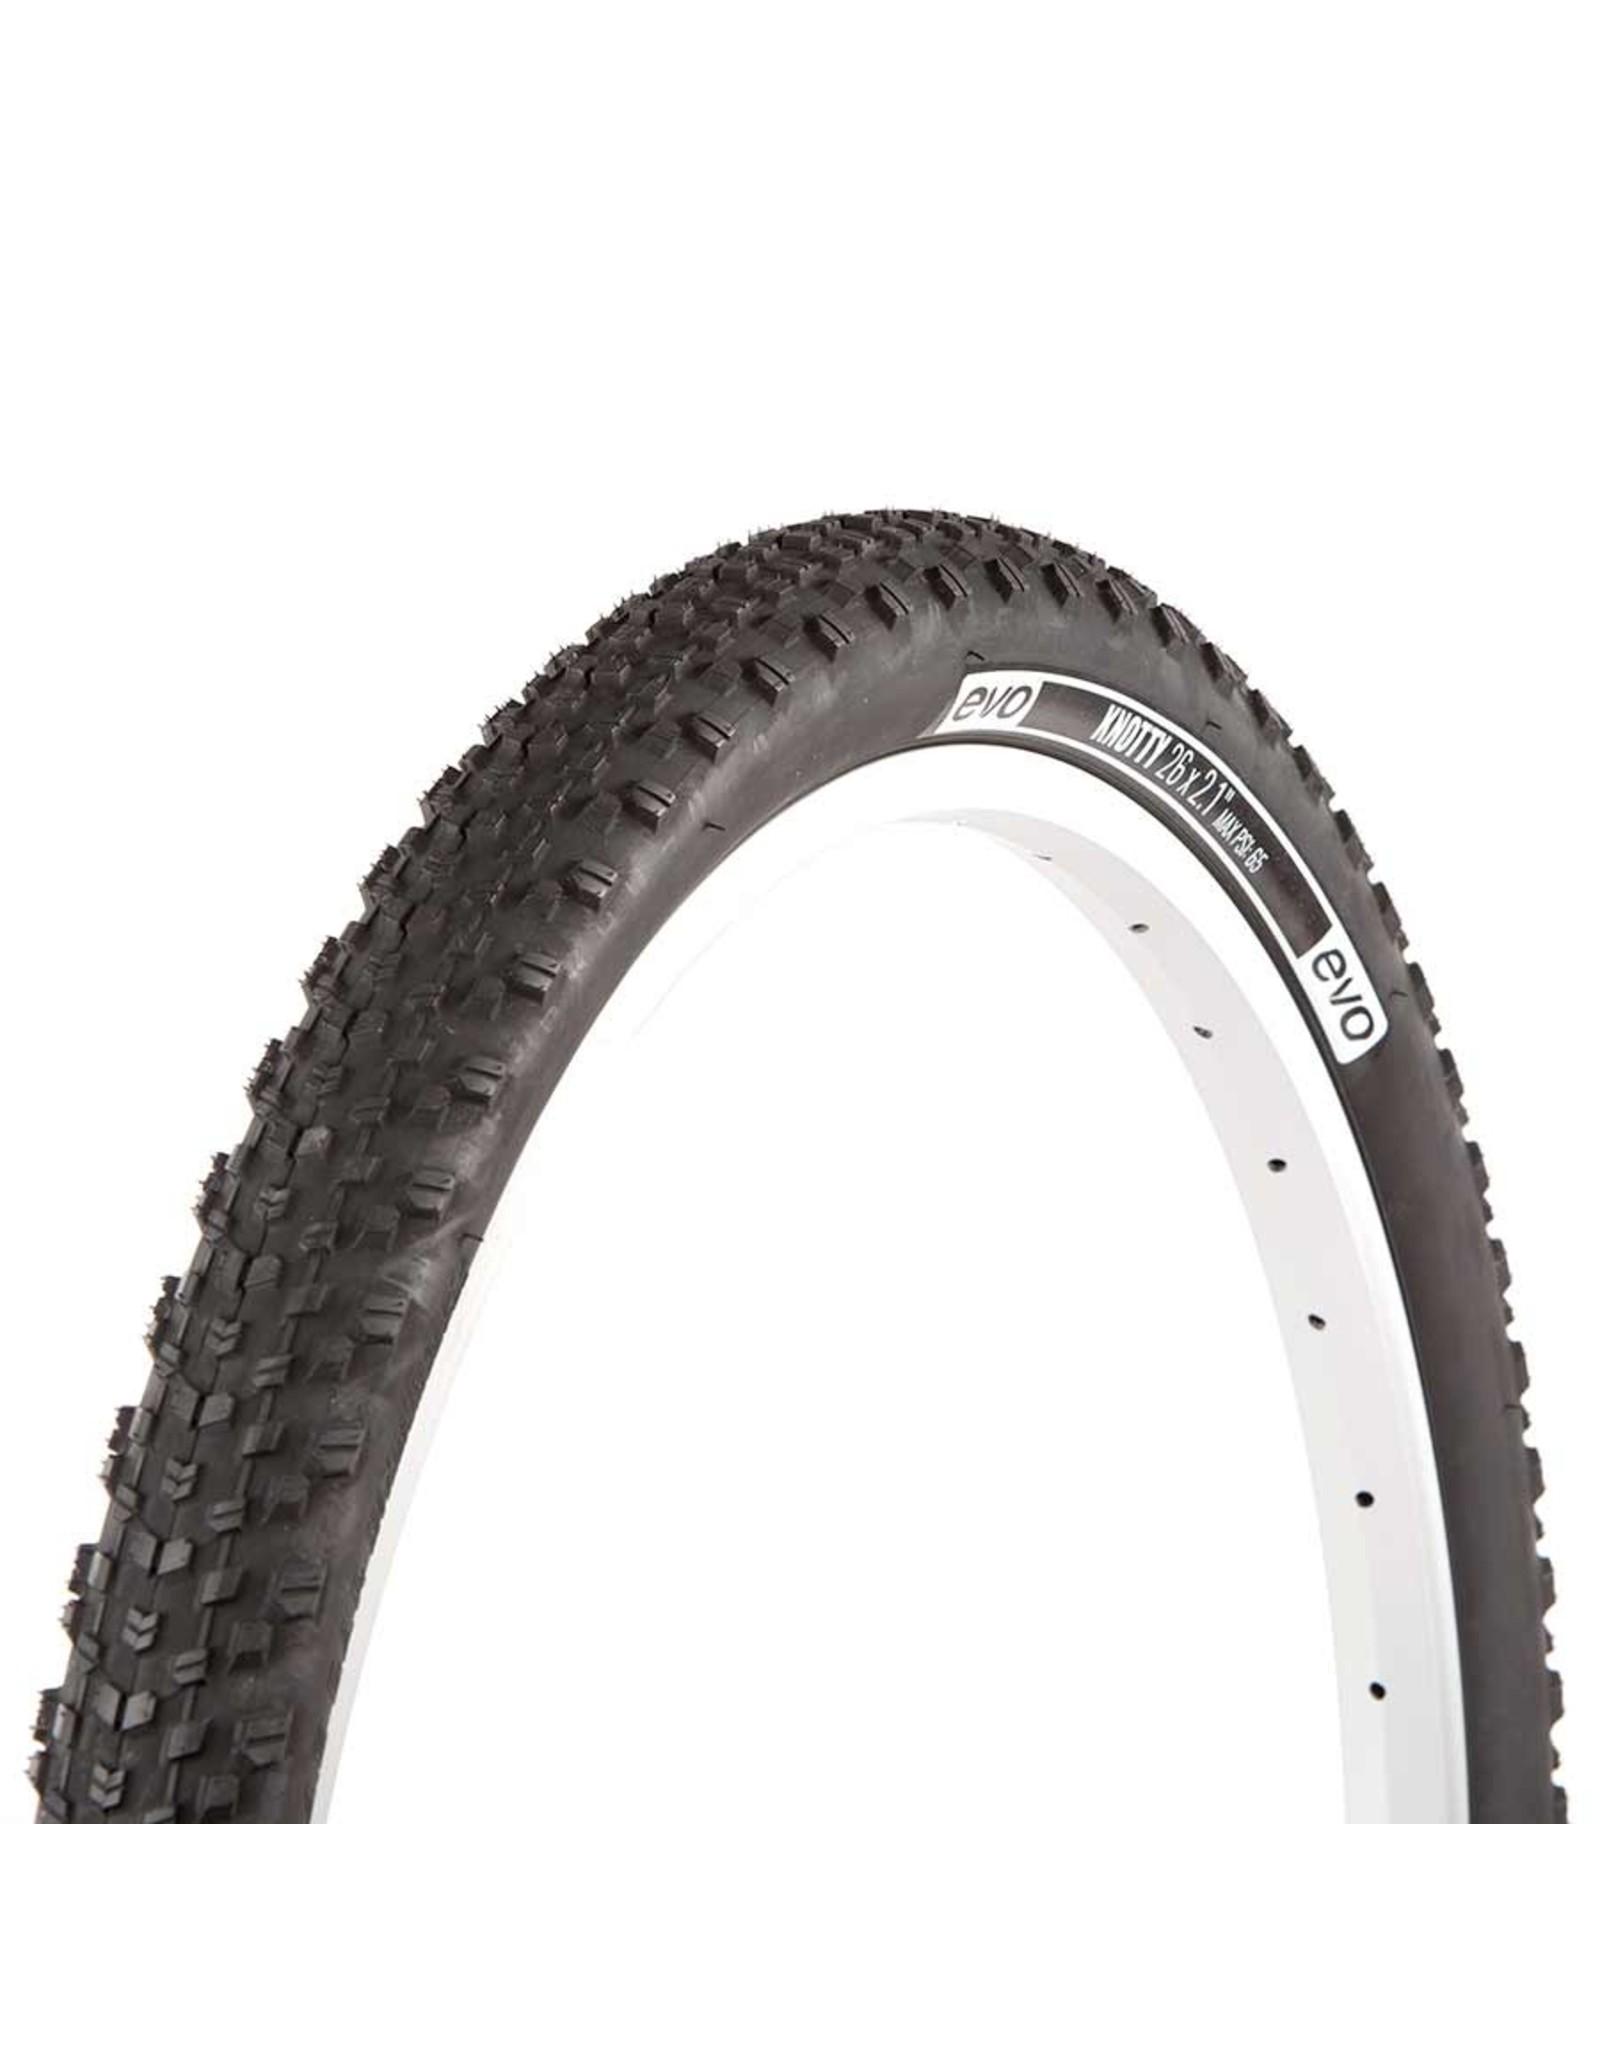 EVO, Knotty, Tire, 27.5''x3.00, Wire, Clincher, Black